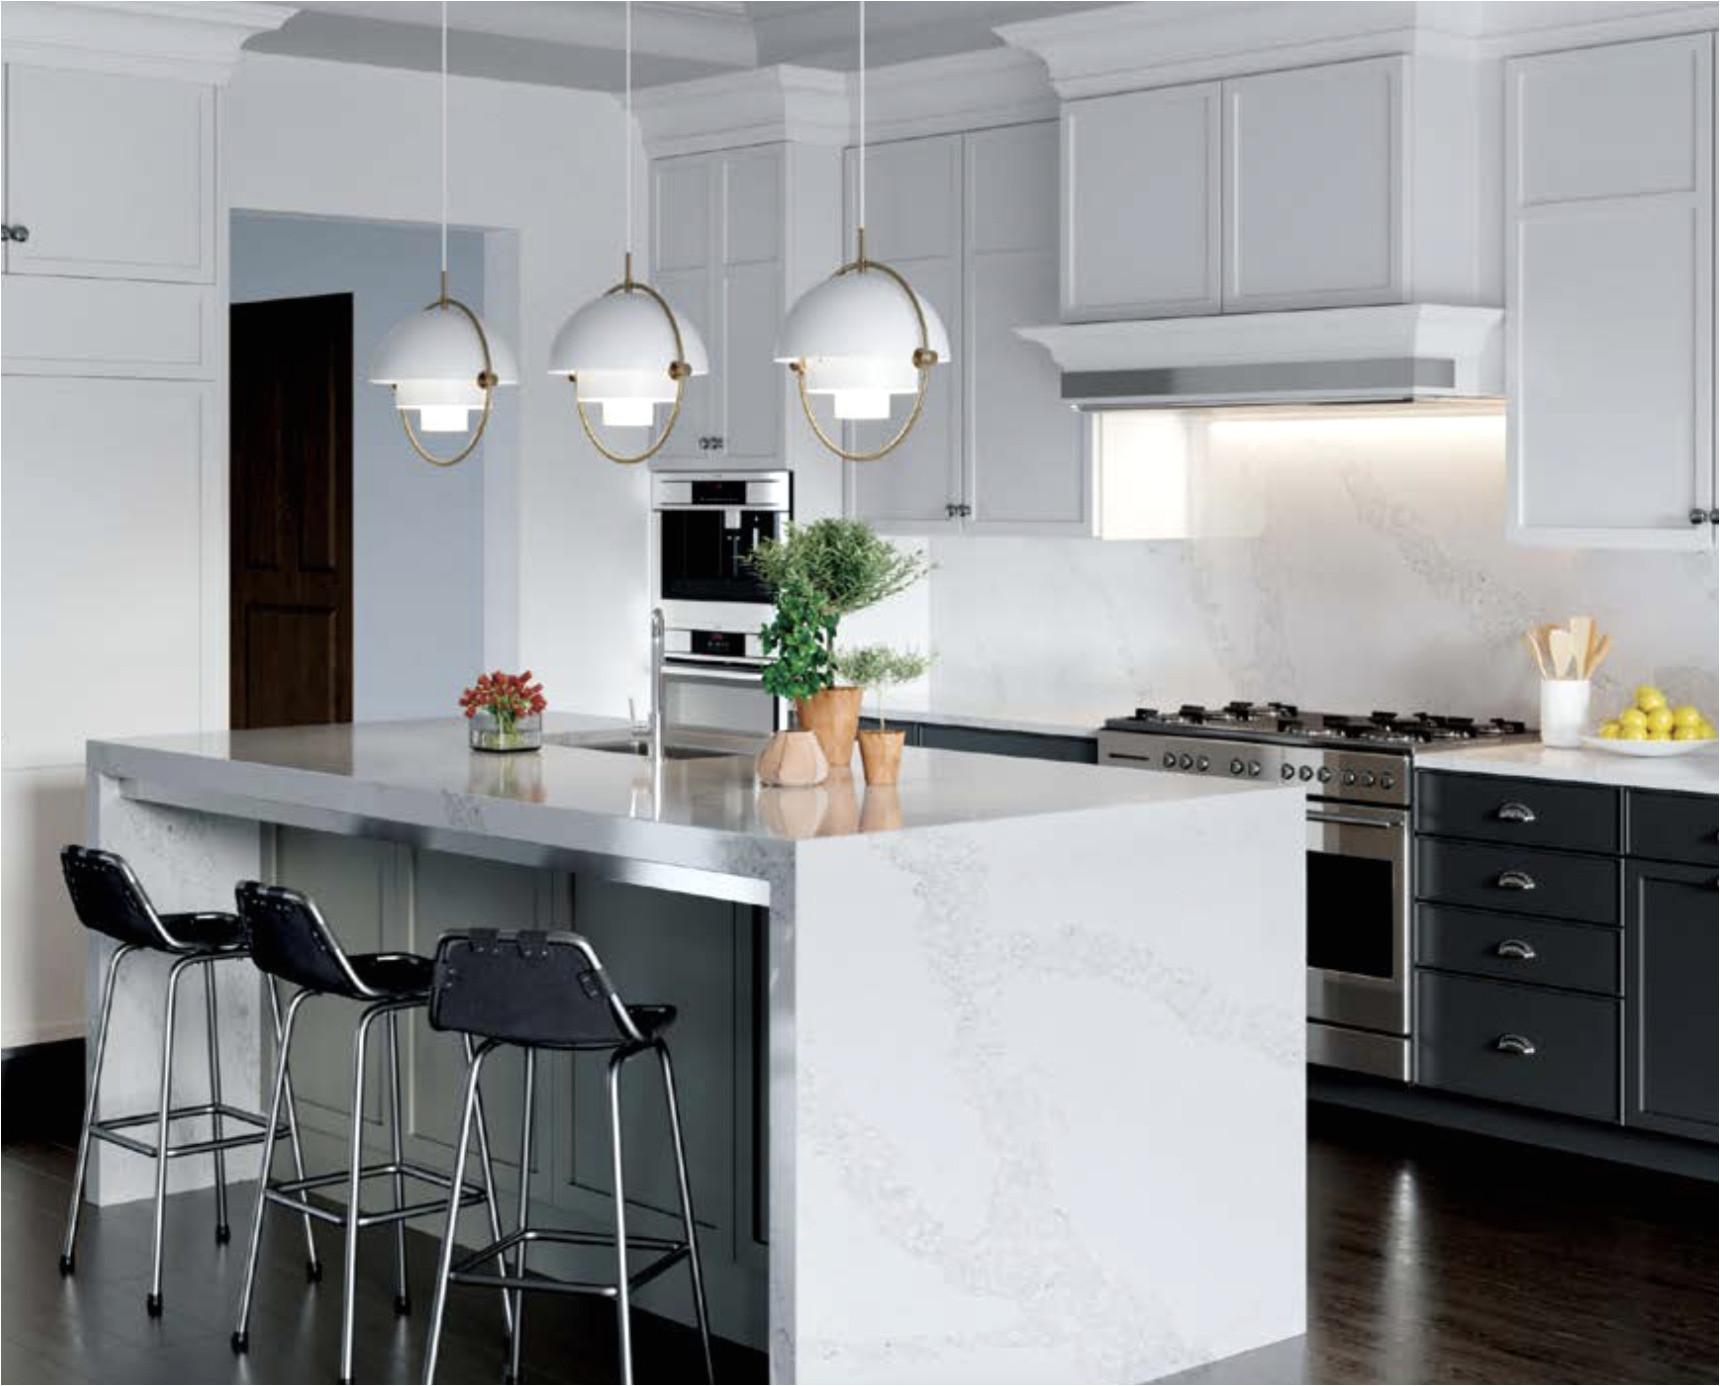 places to buy granite countertops near me elegant quartz vs granite countertops a decision not